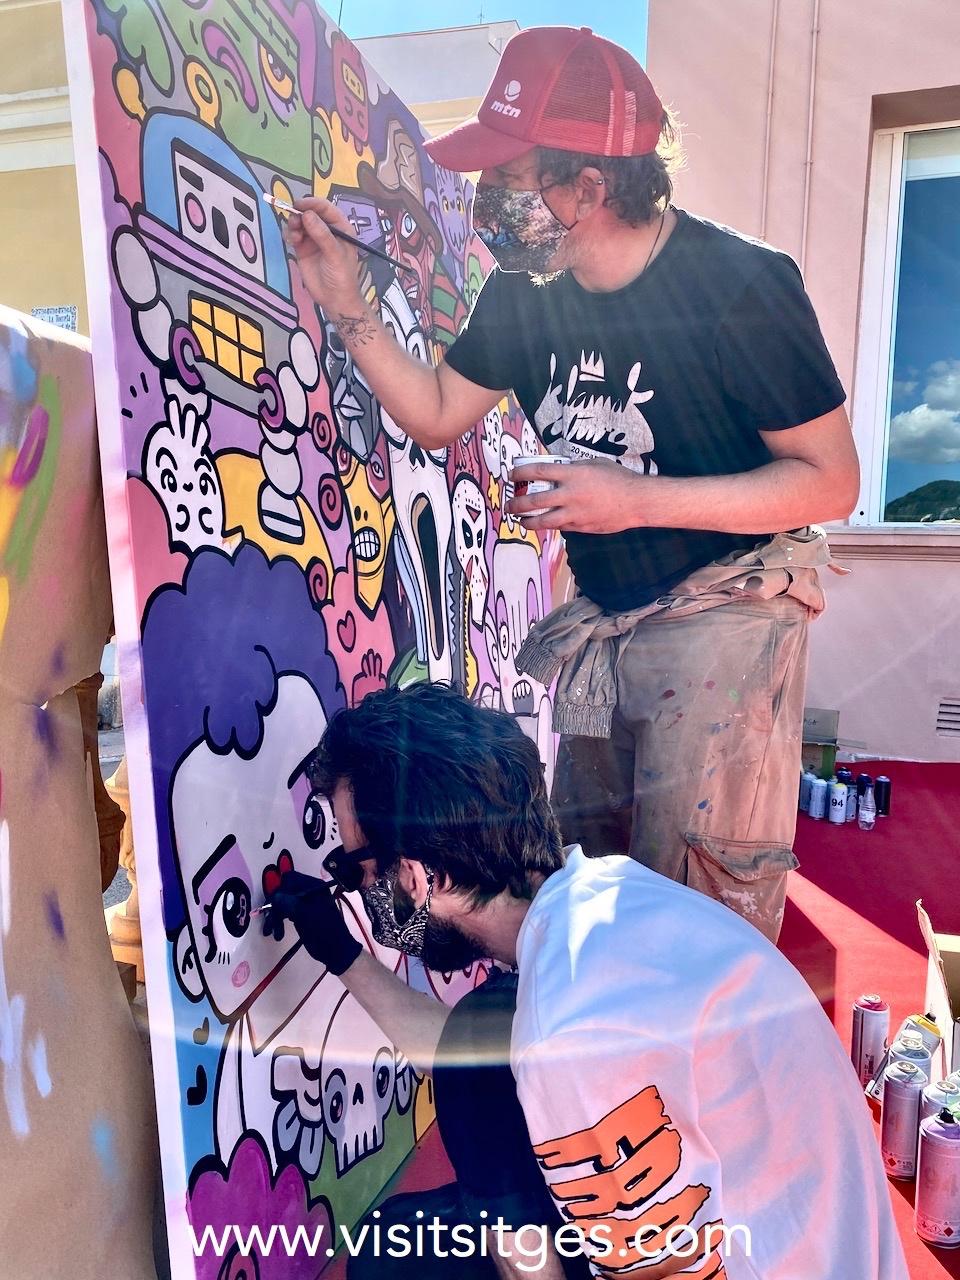 Fantastic Street Art Sitges 2020